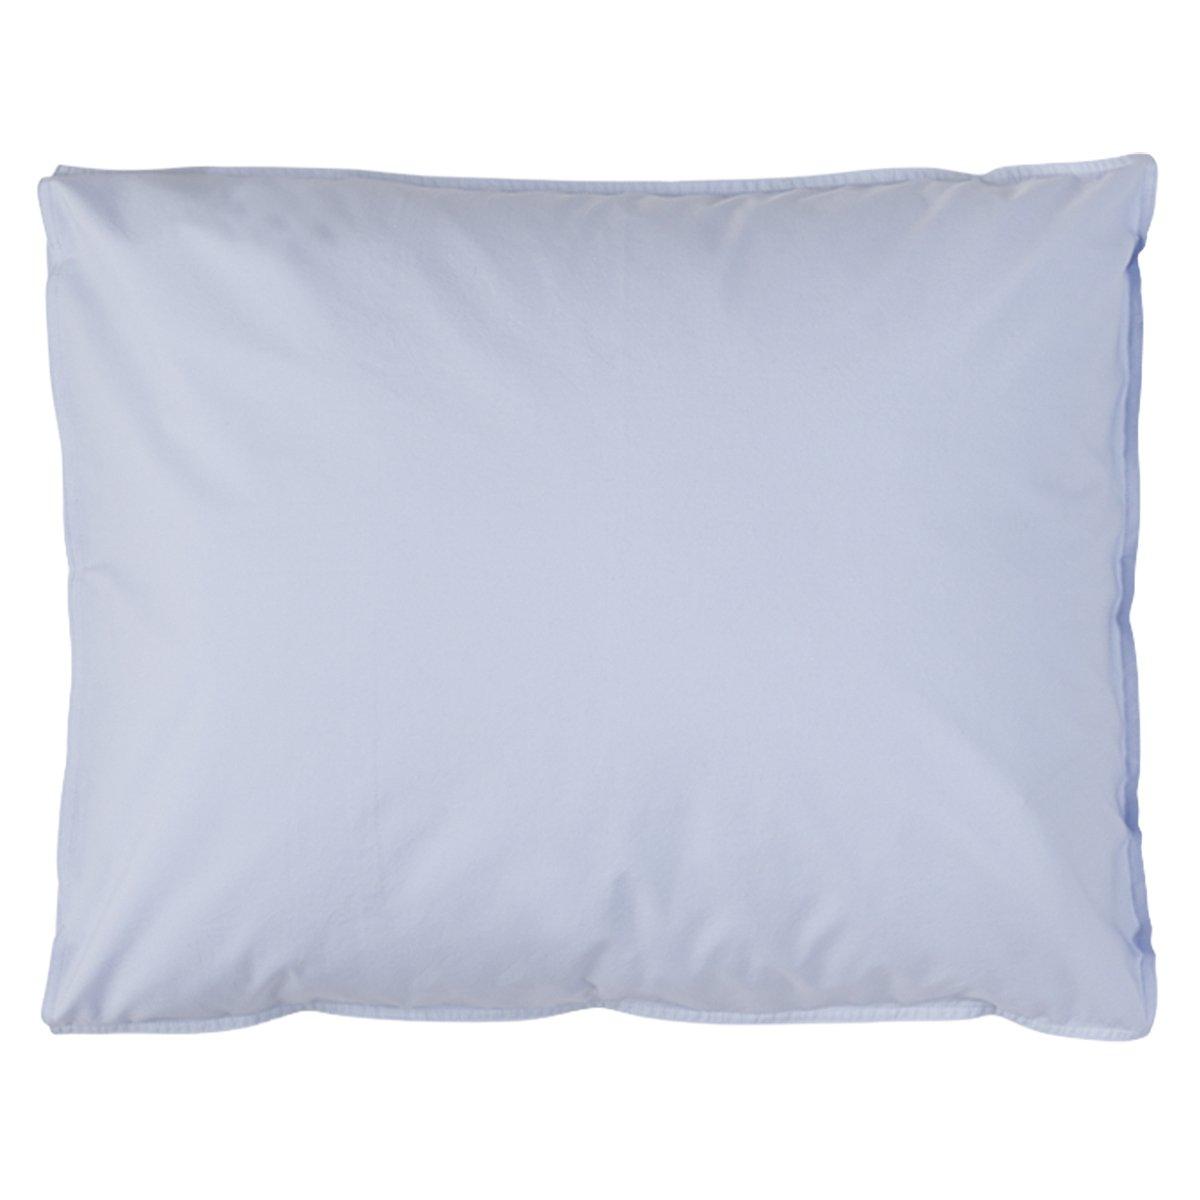 Matri Noora Pillowcase, Light Blue